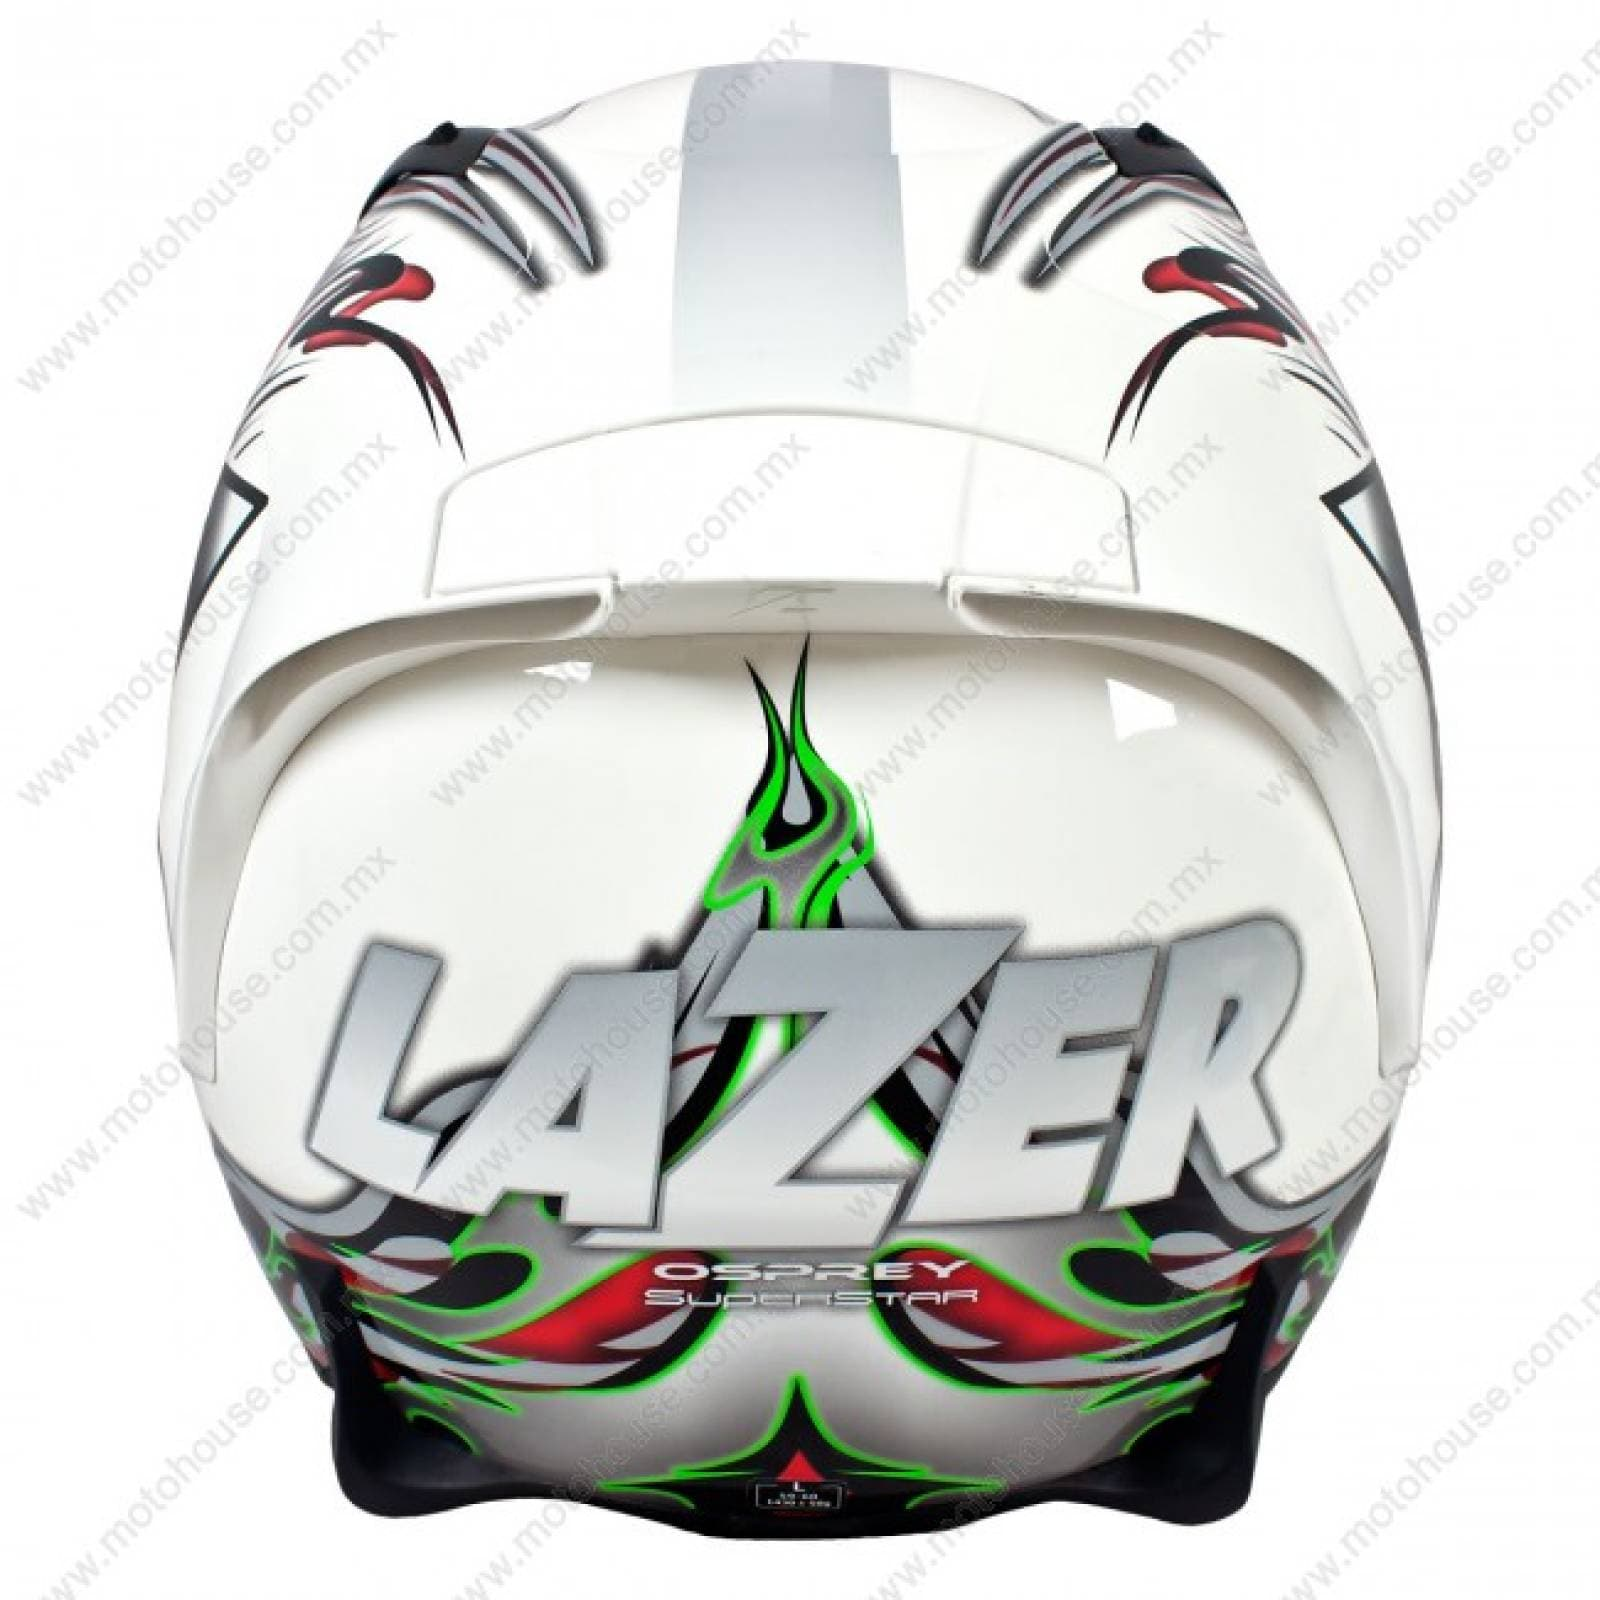 CASCO OSPREY SUPER STAR PURE GLASS LAZER